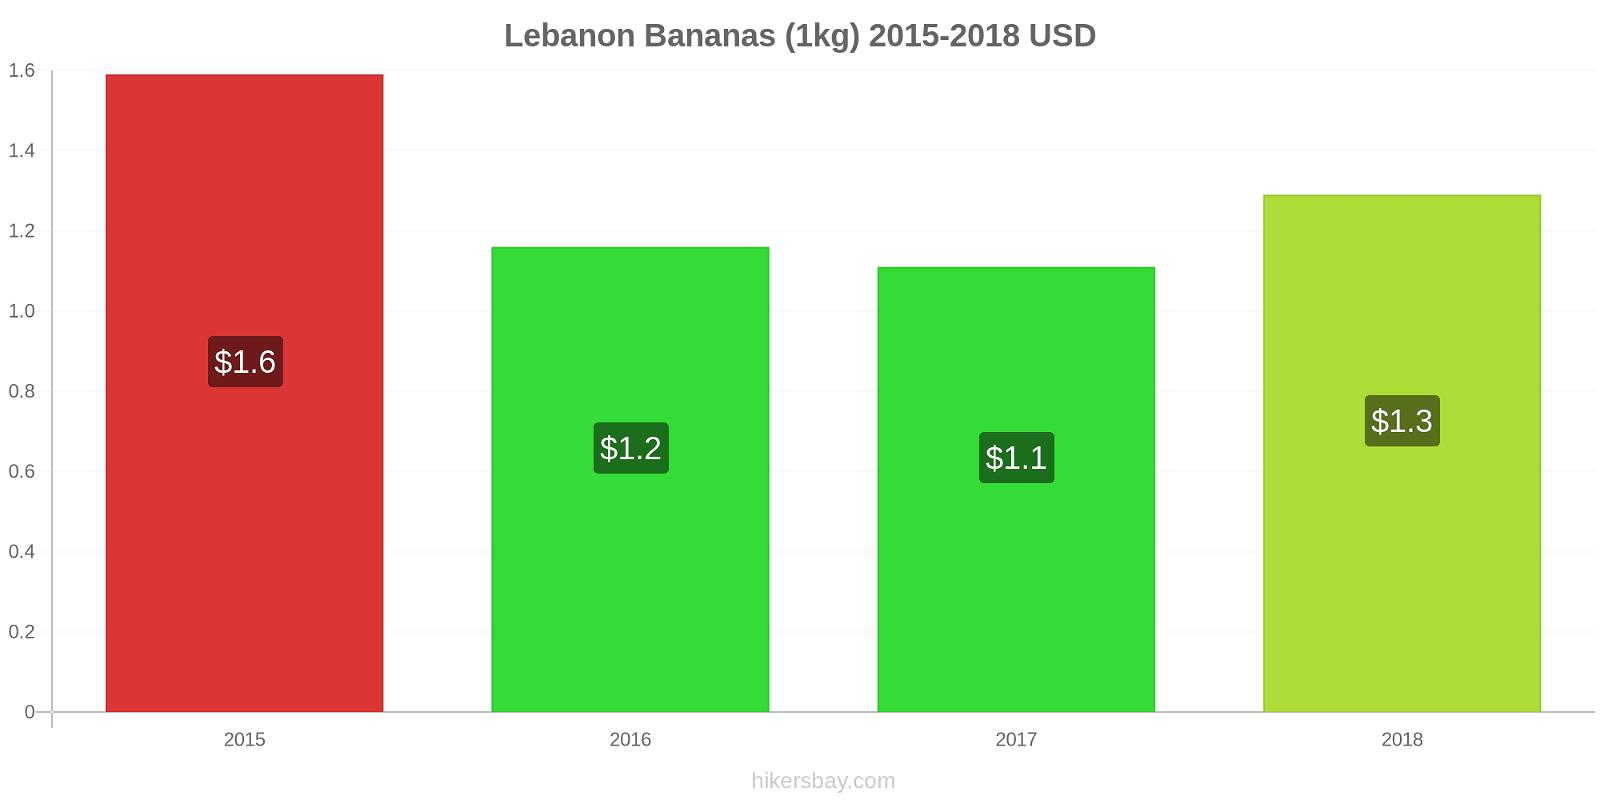 Lebanon price changes Bananas (1kg) hikersbay.com